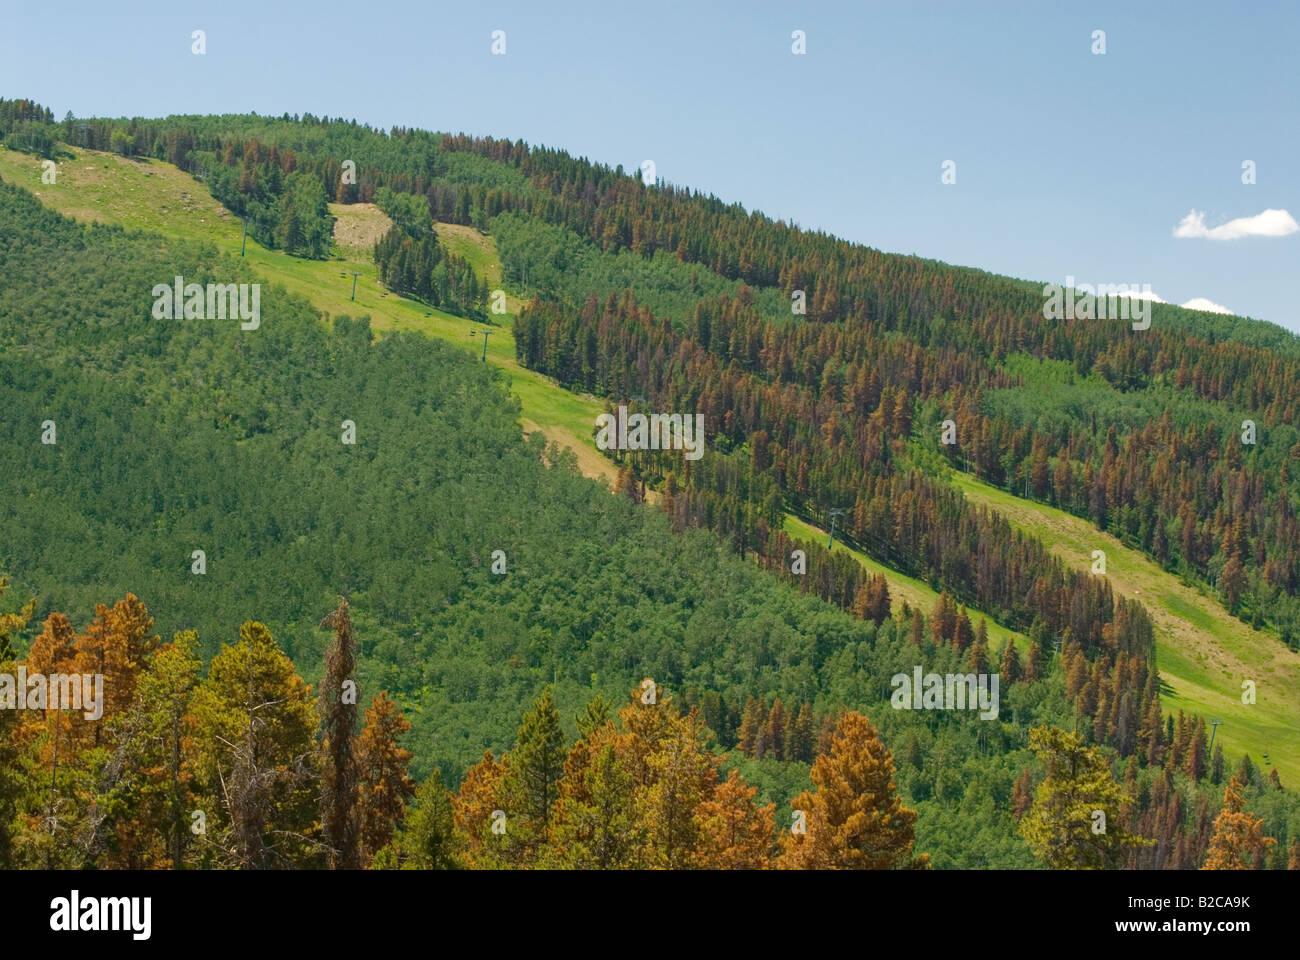 Diseased pine trees with Bark beetle infestation above Beaver Creek Colorado - Stock Image